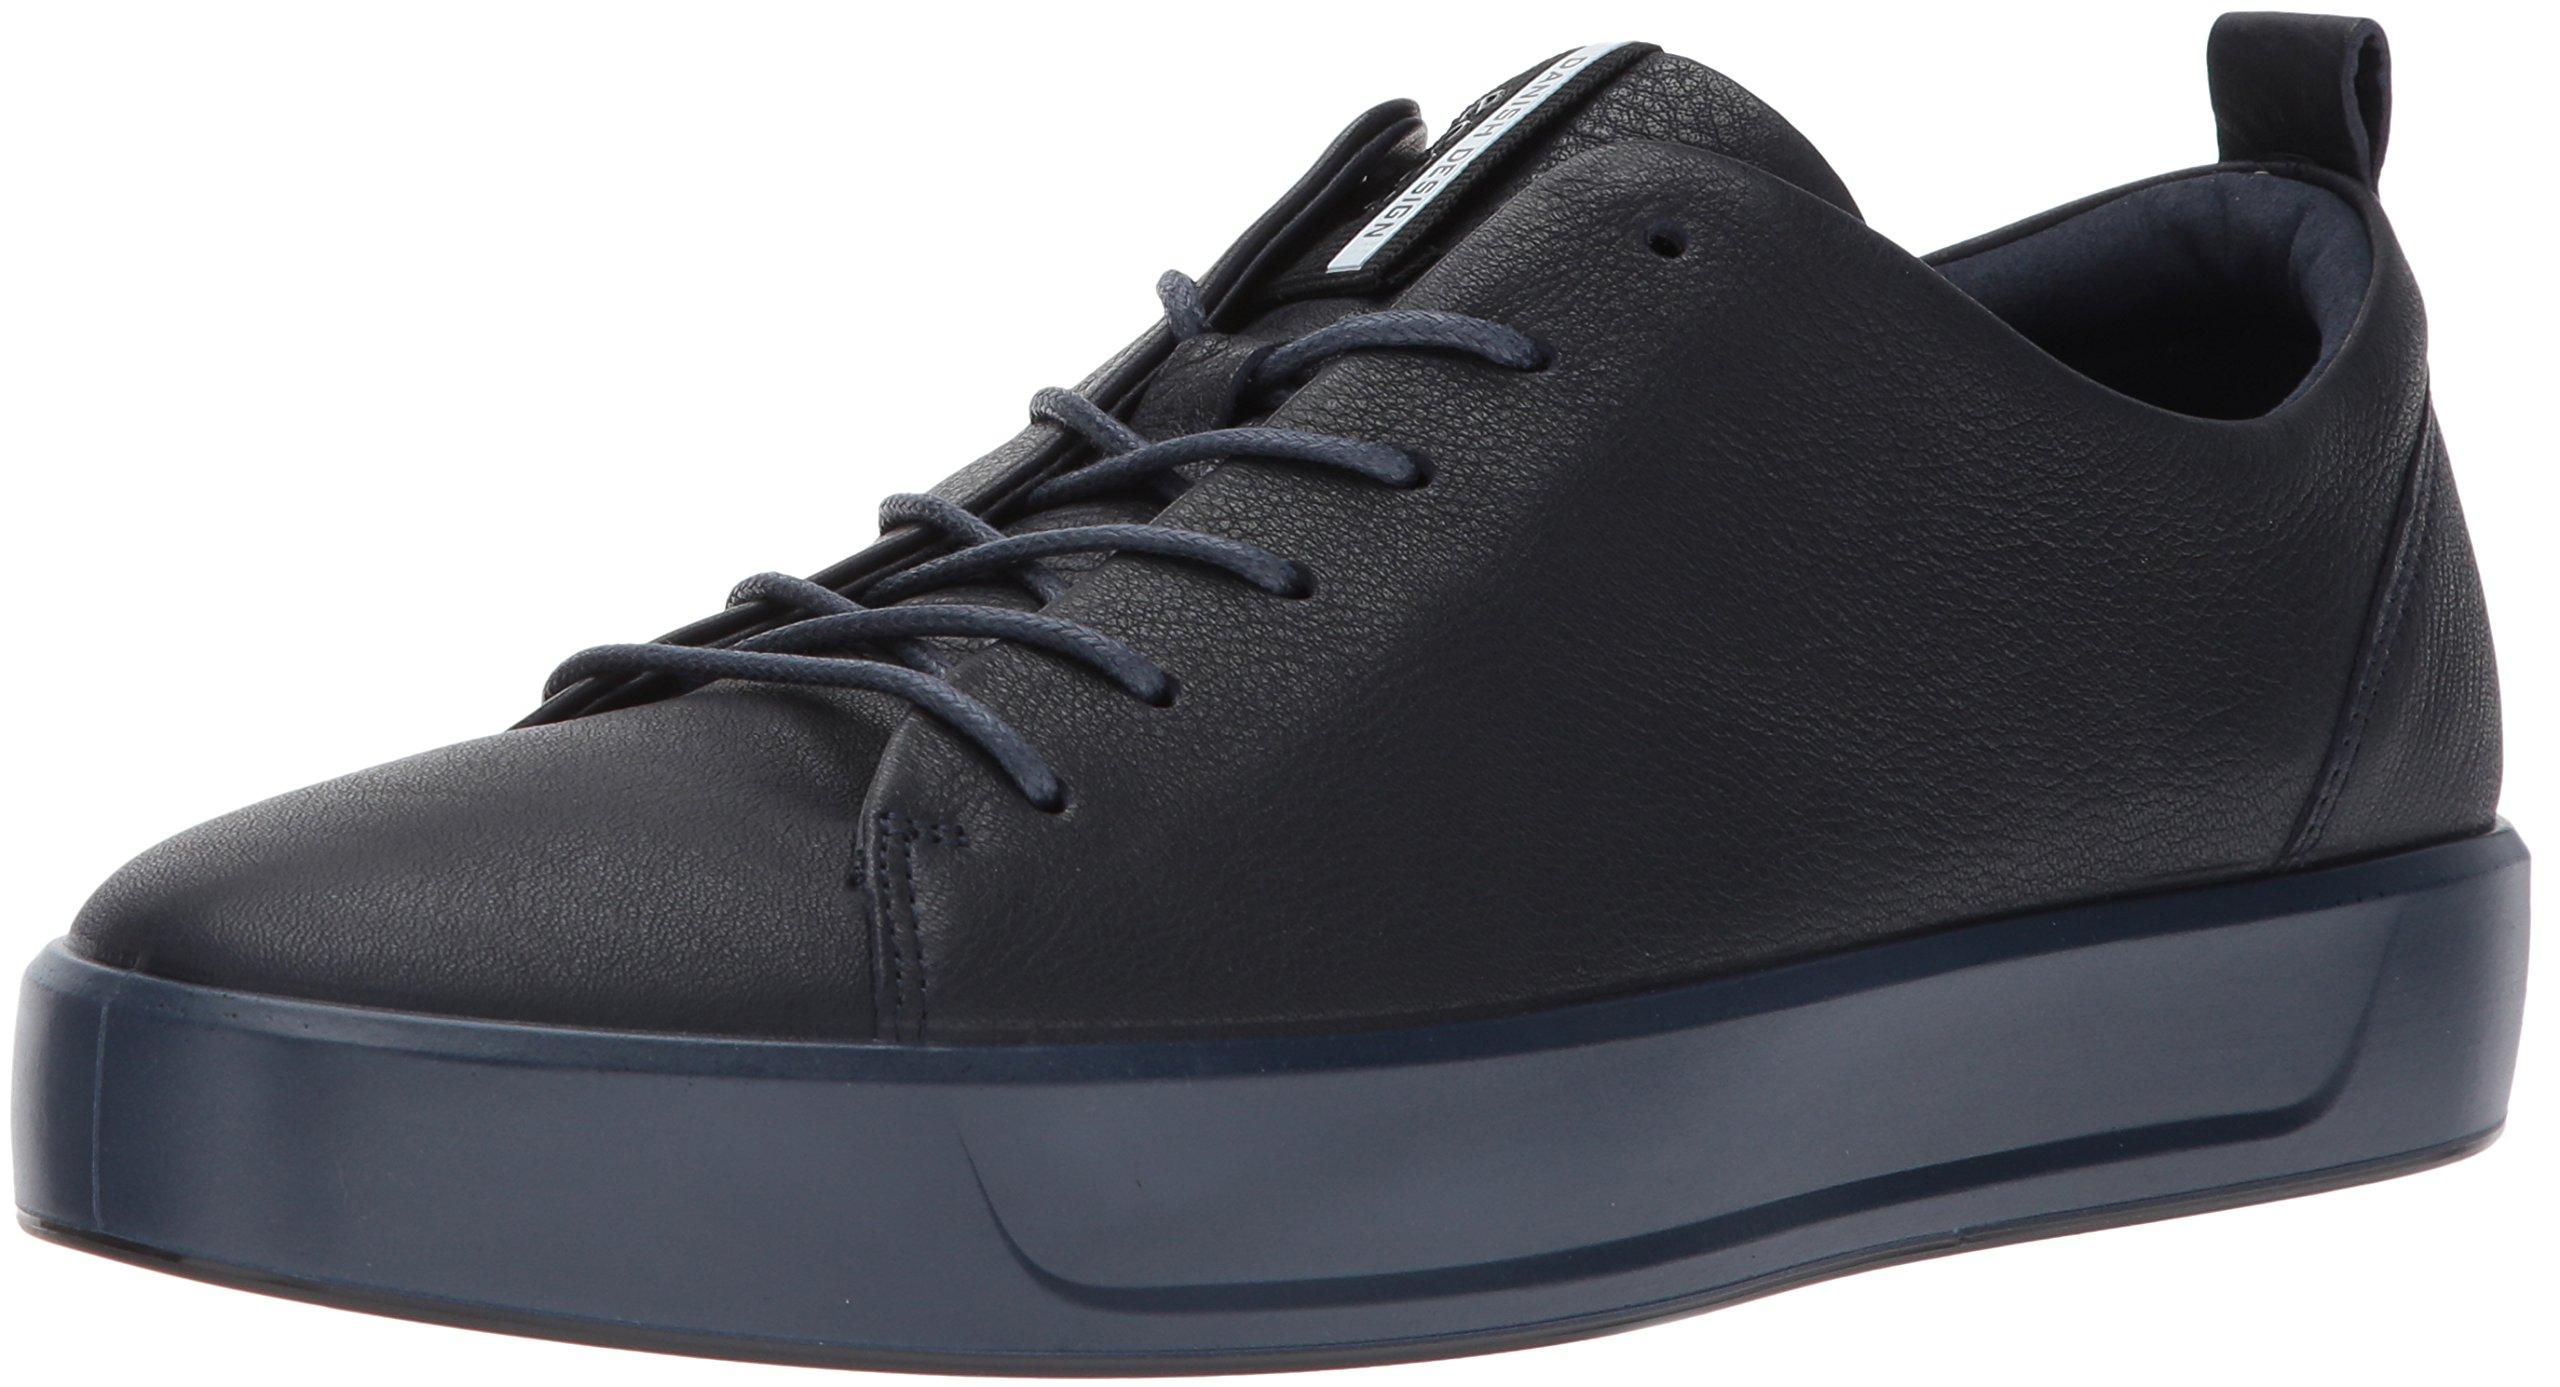 ECCO Men's Soft 8 Tie Fashion Sneaker, Night Sky/Black, 39 M EU/5-5.5 D(M) US